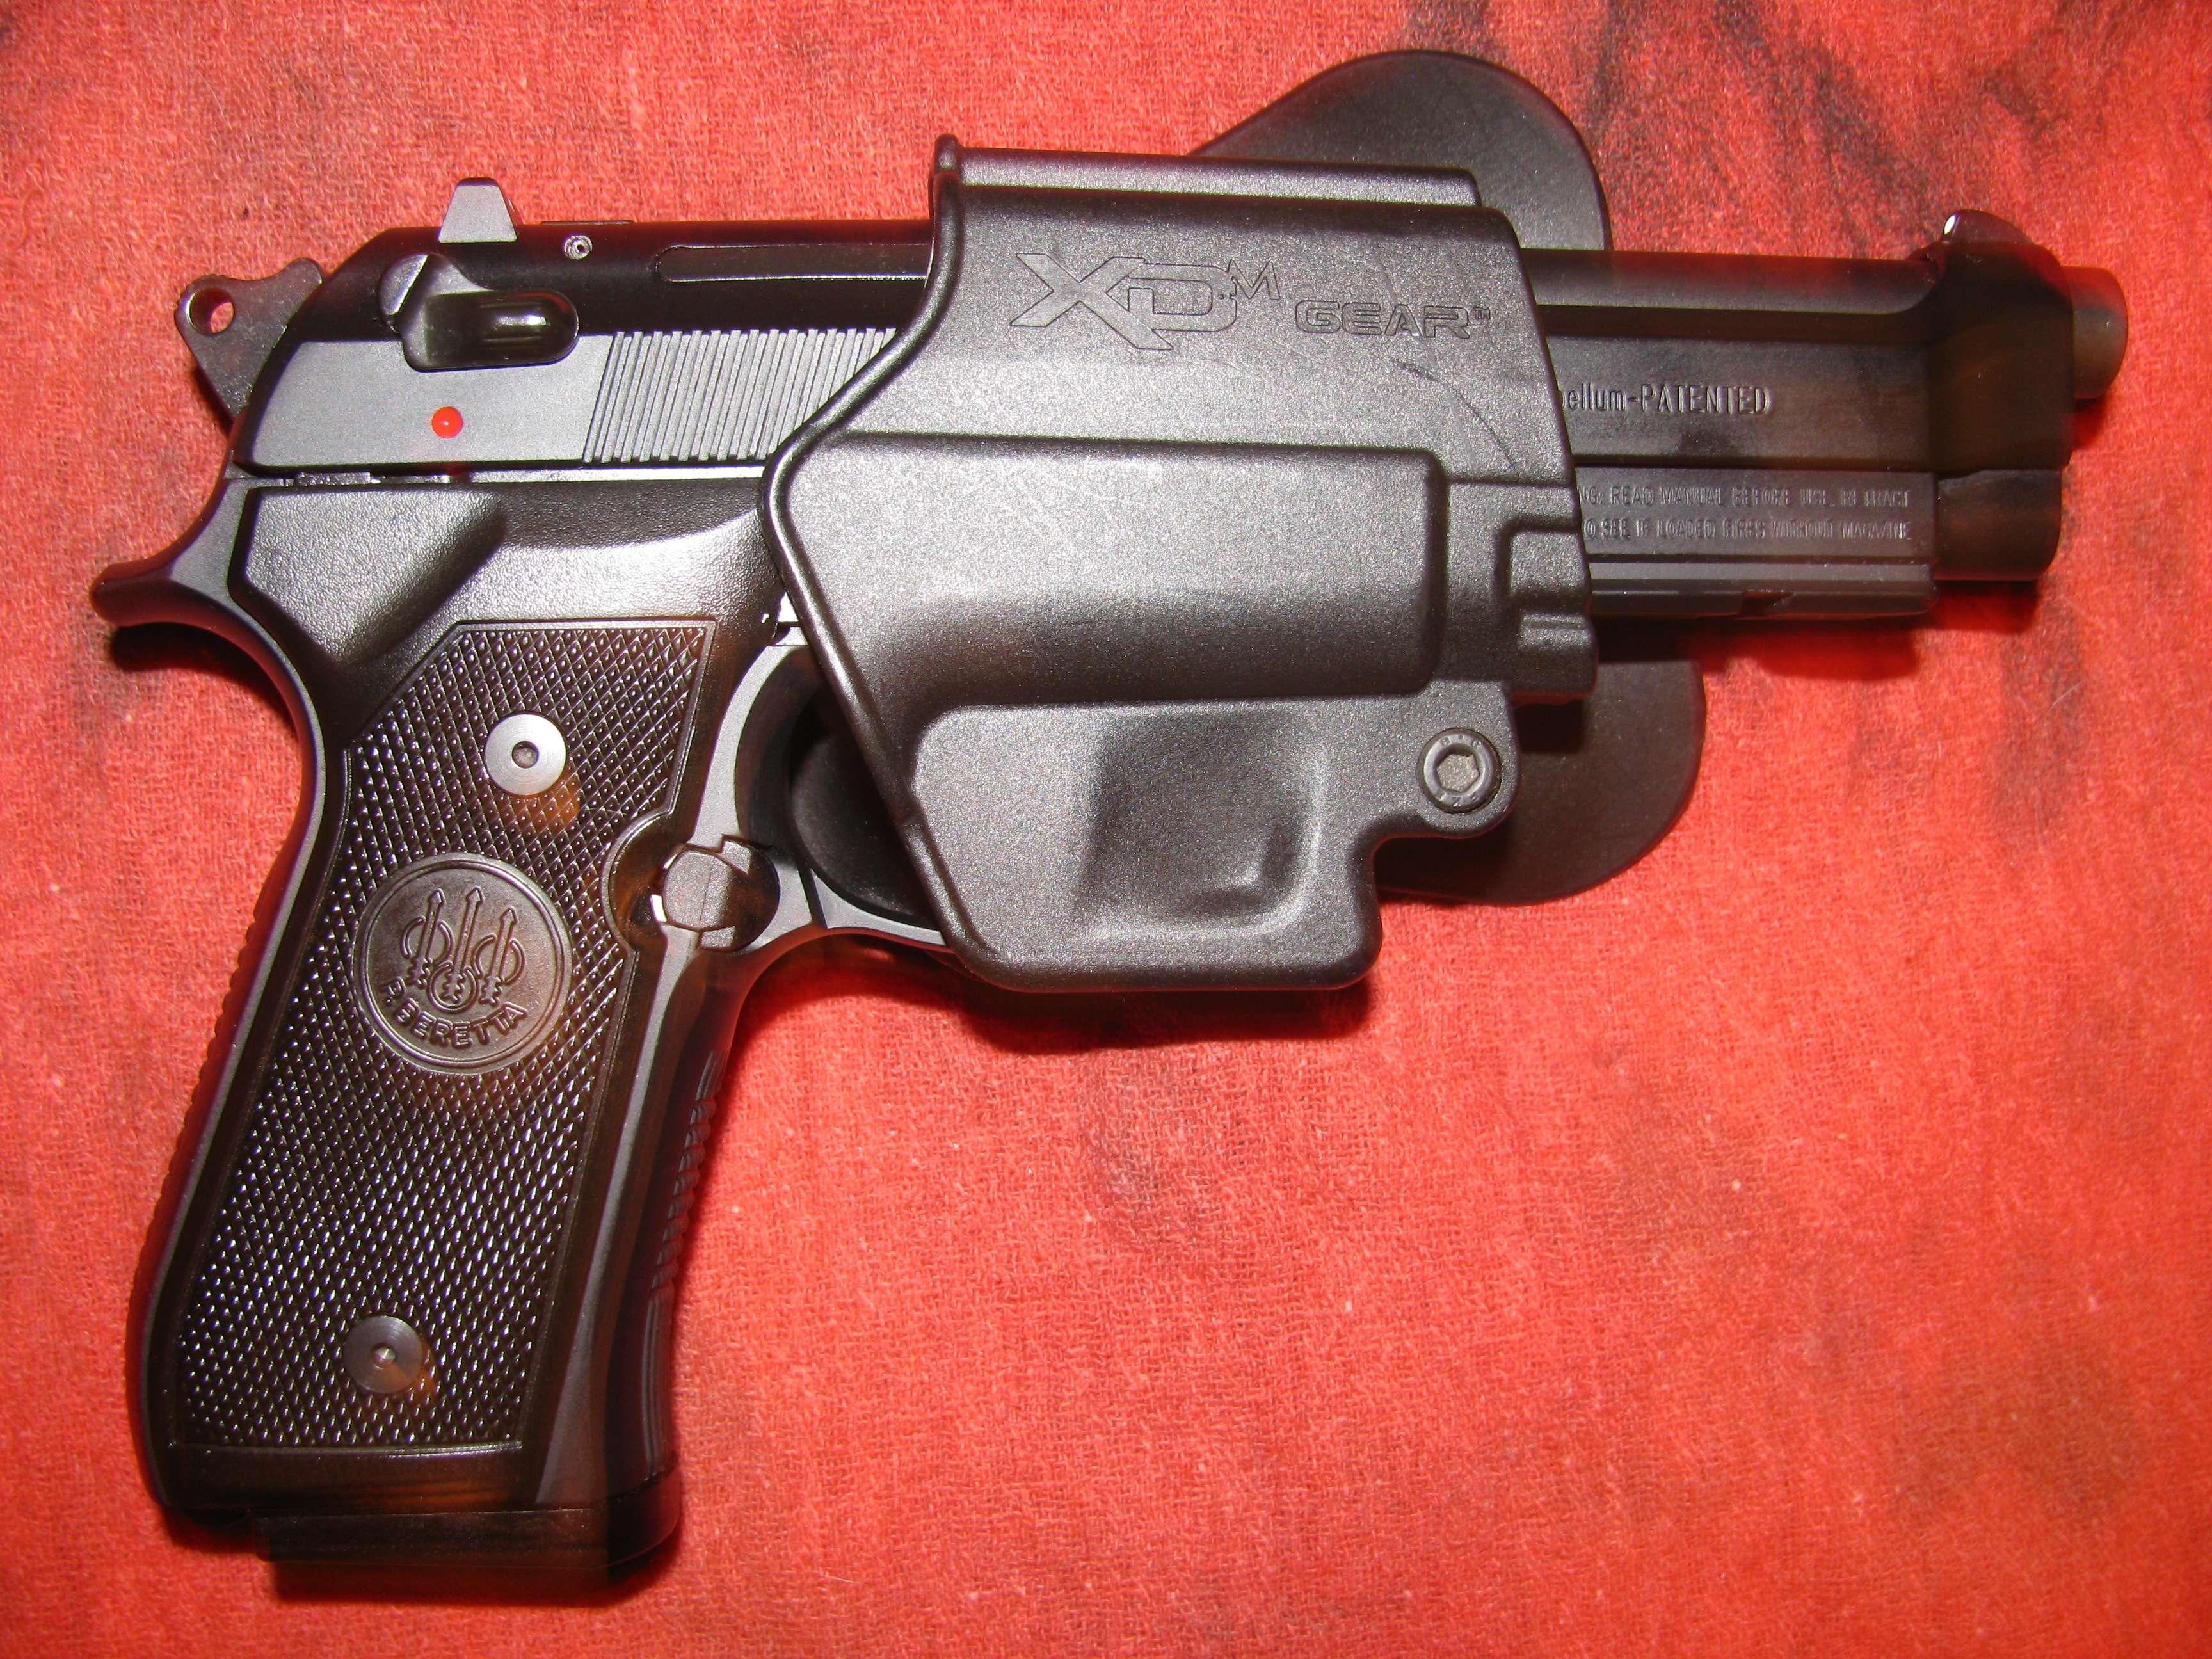 M9a1 - Semi-Auto Handguns